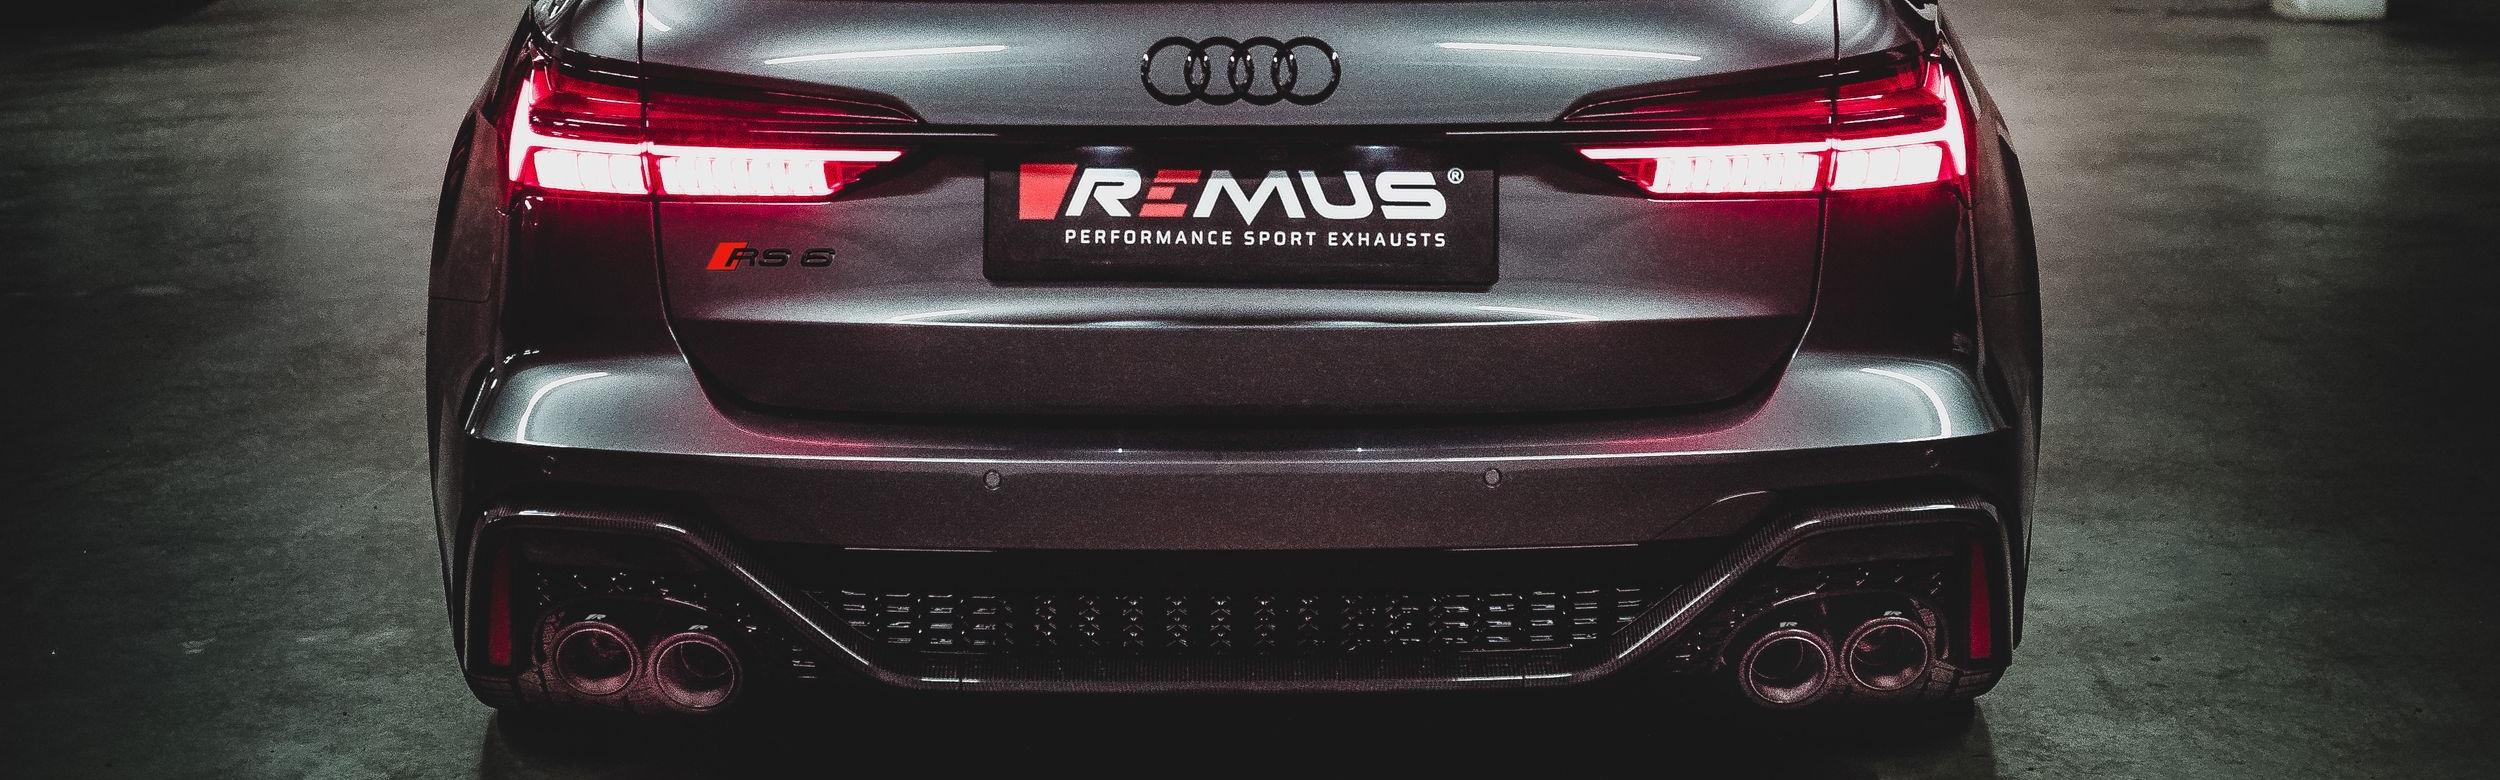 Audi RS6 RS7 Remus